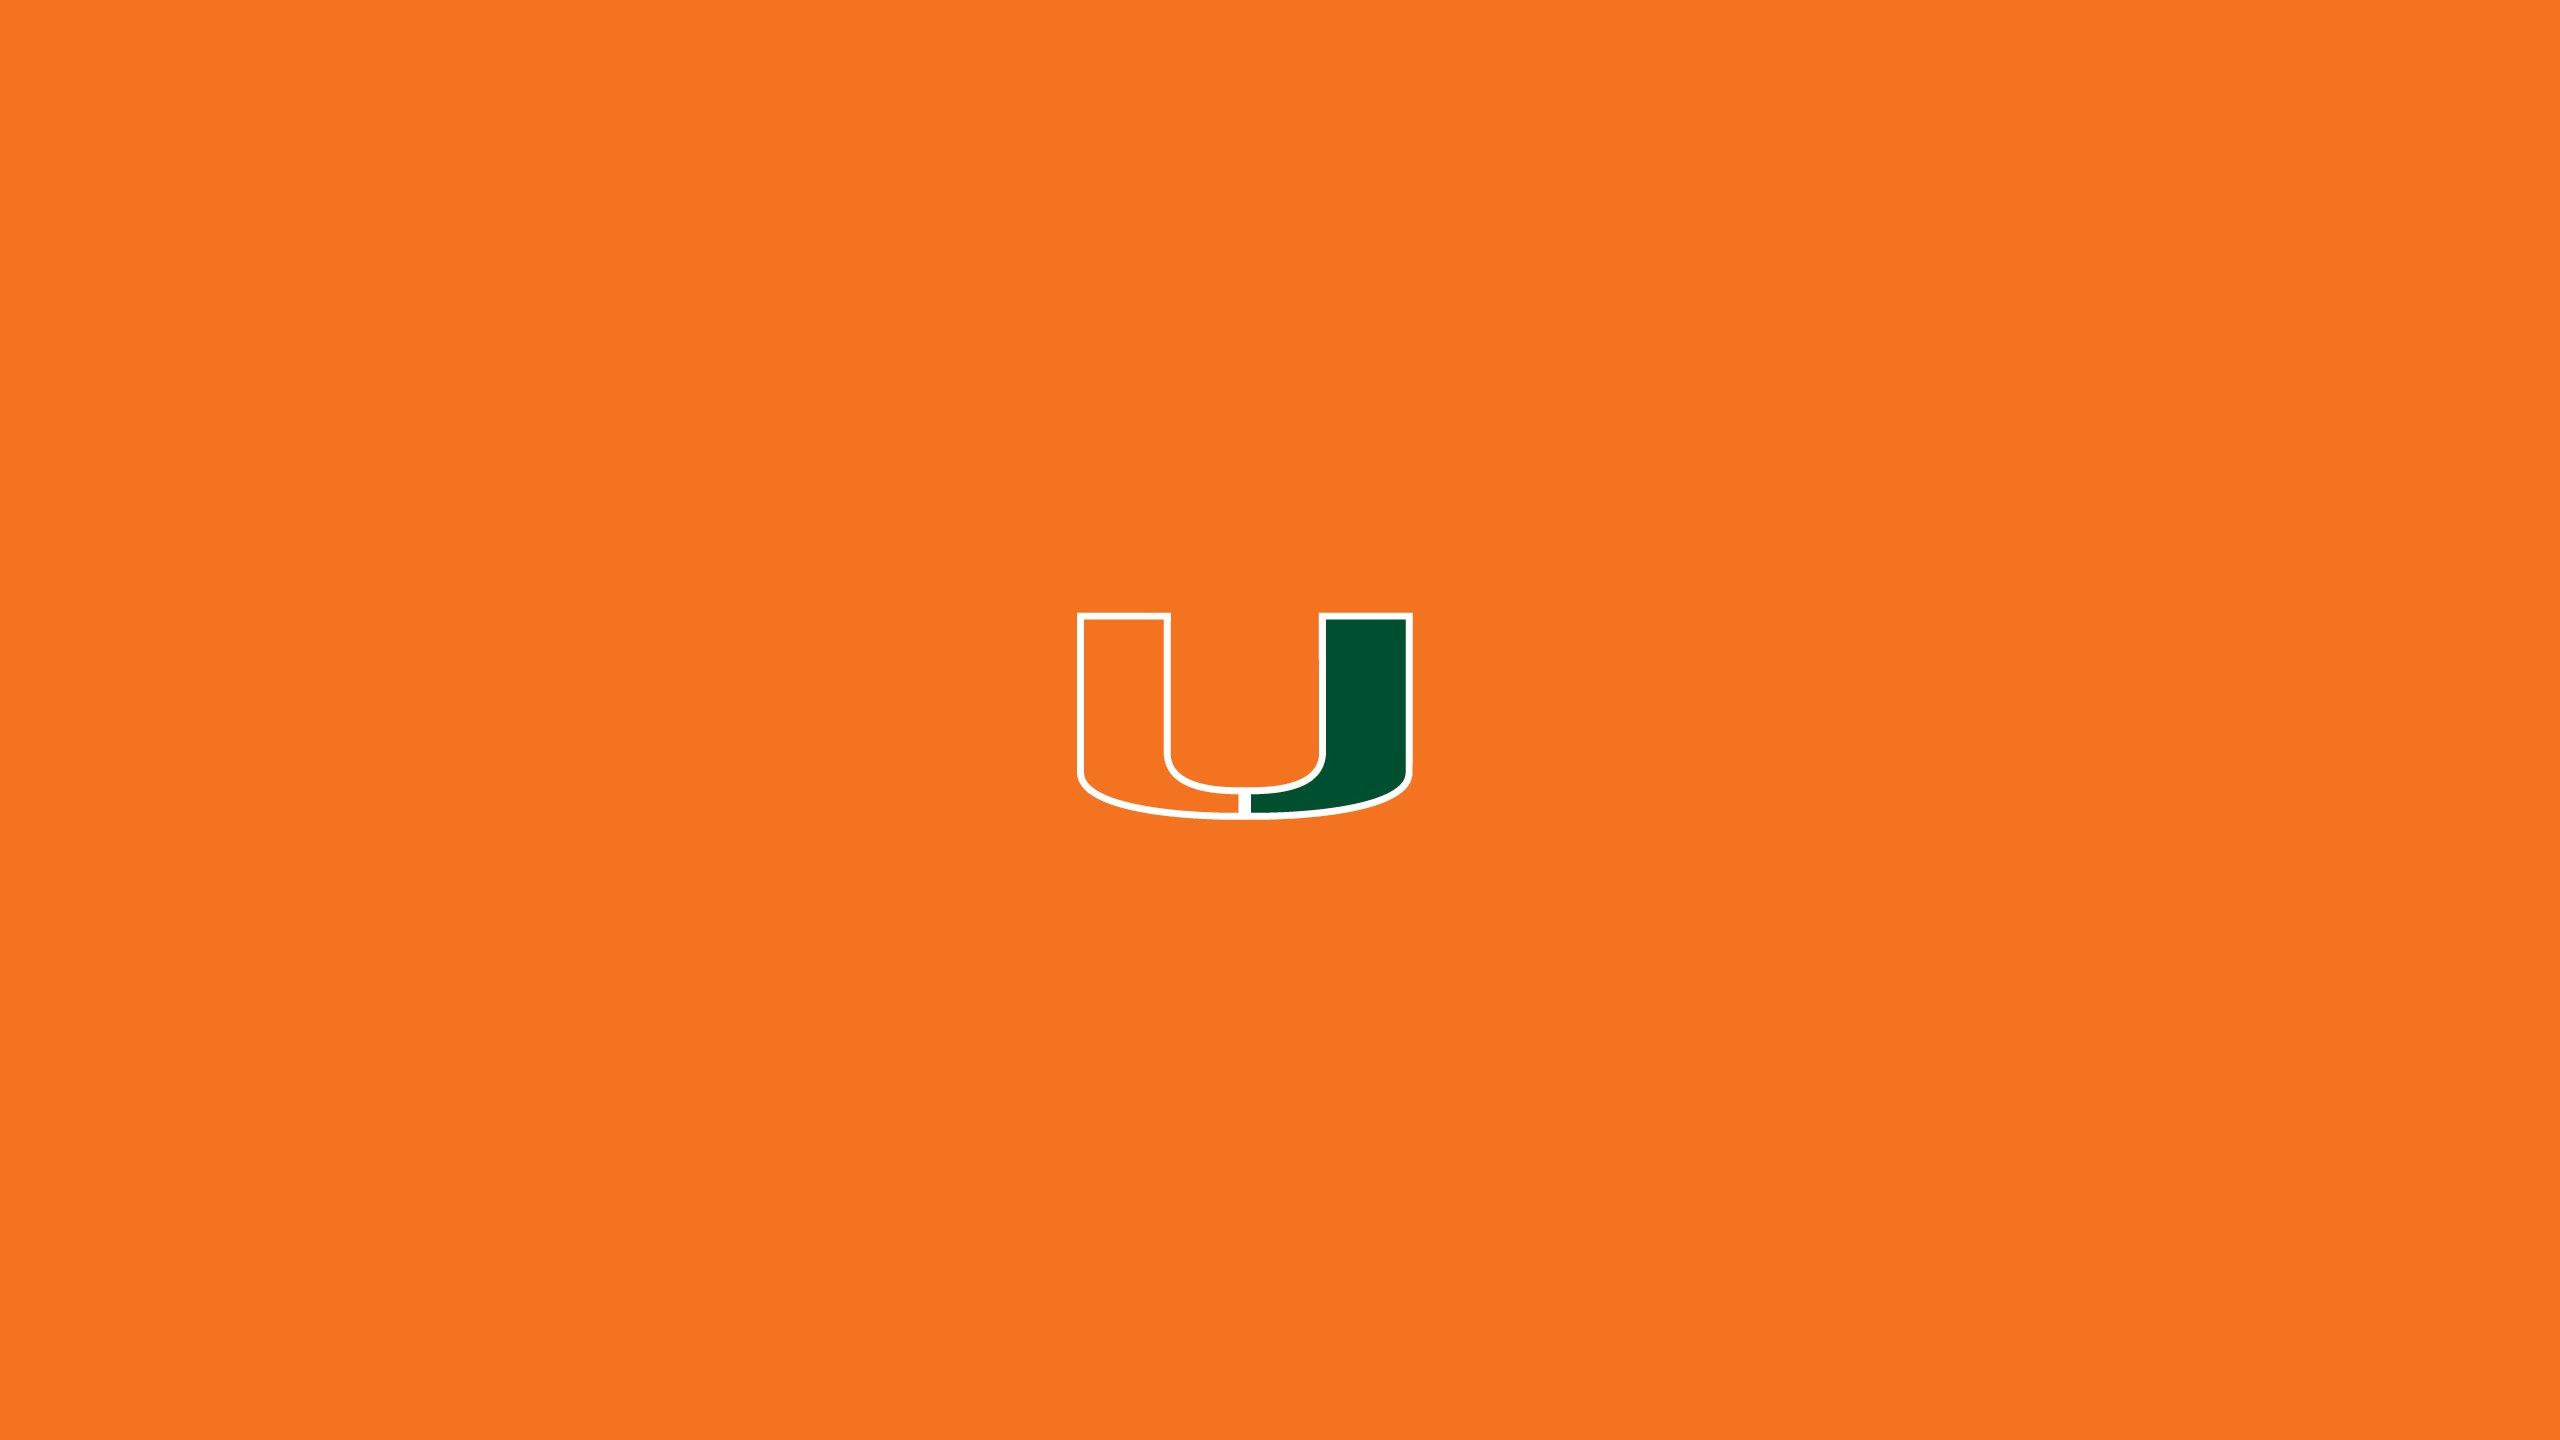 University Miami Hurricanes Official Athletic >> Um Wallpaper - WallpaperSafari